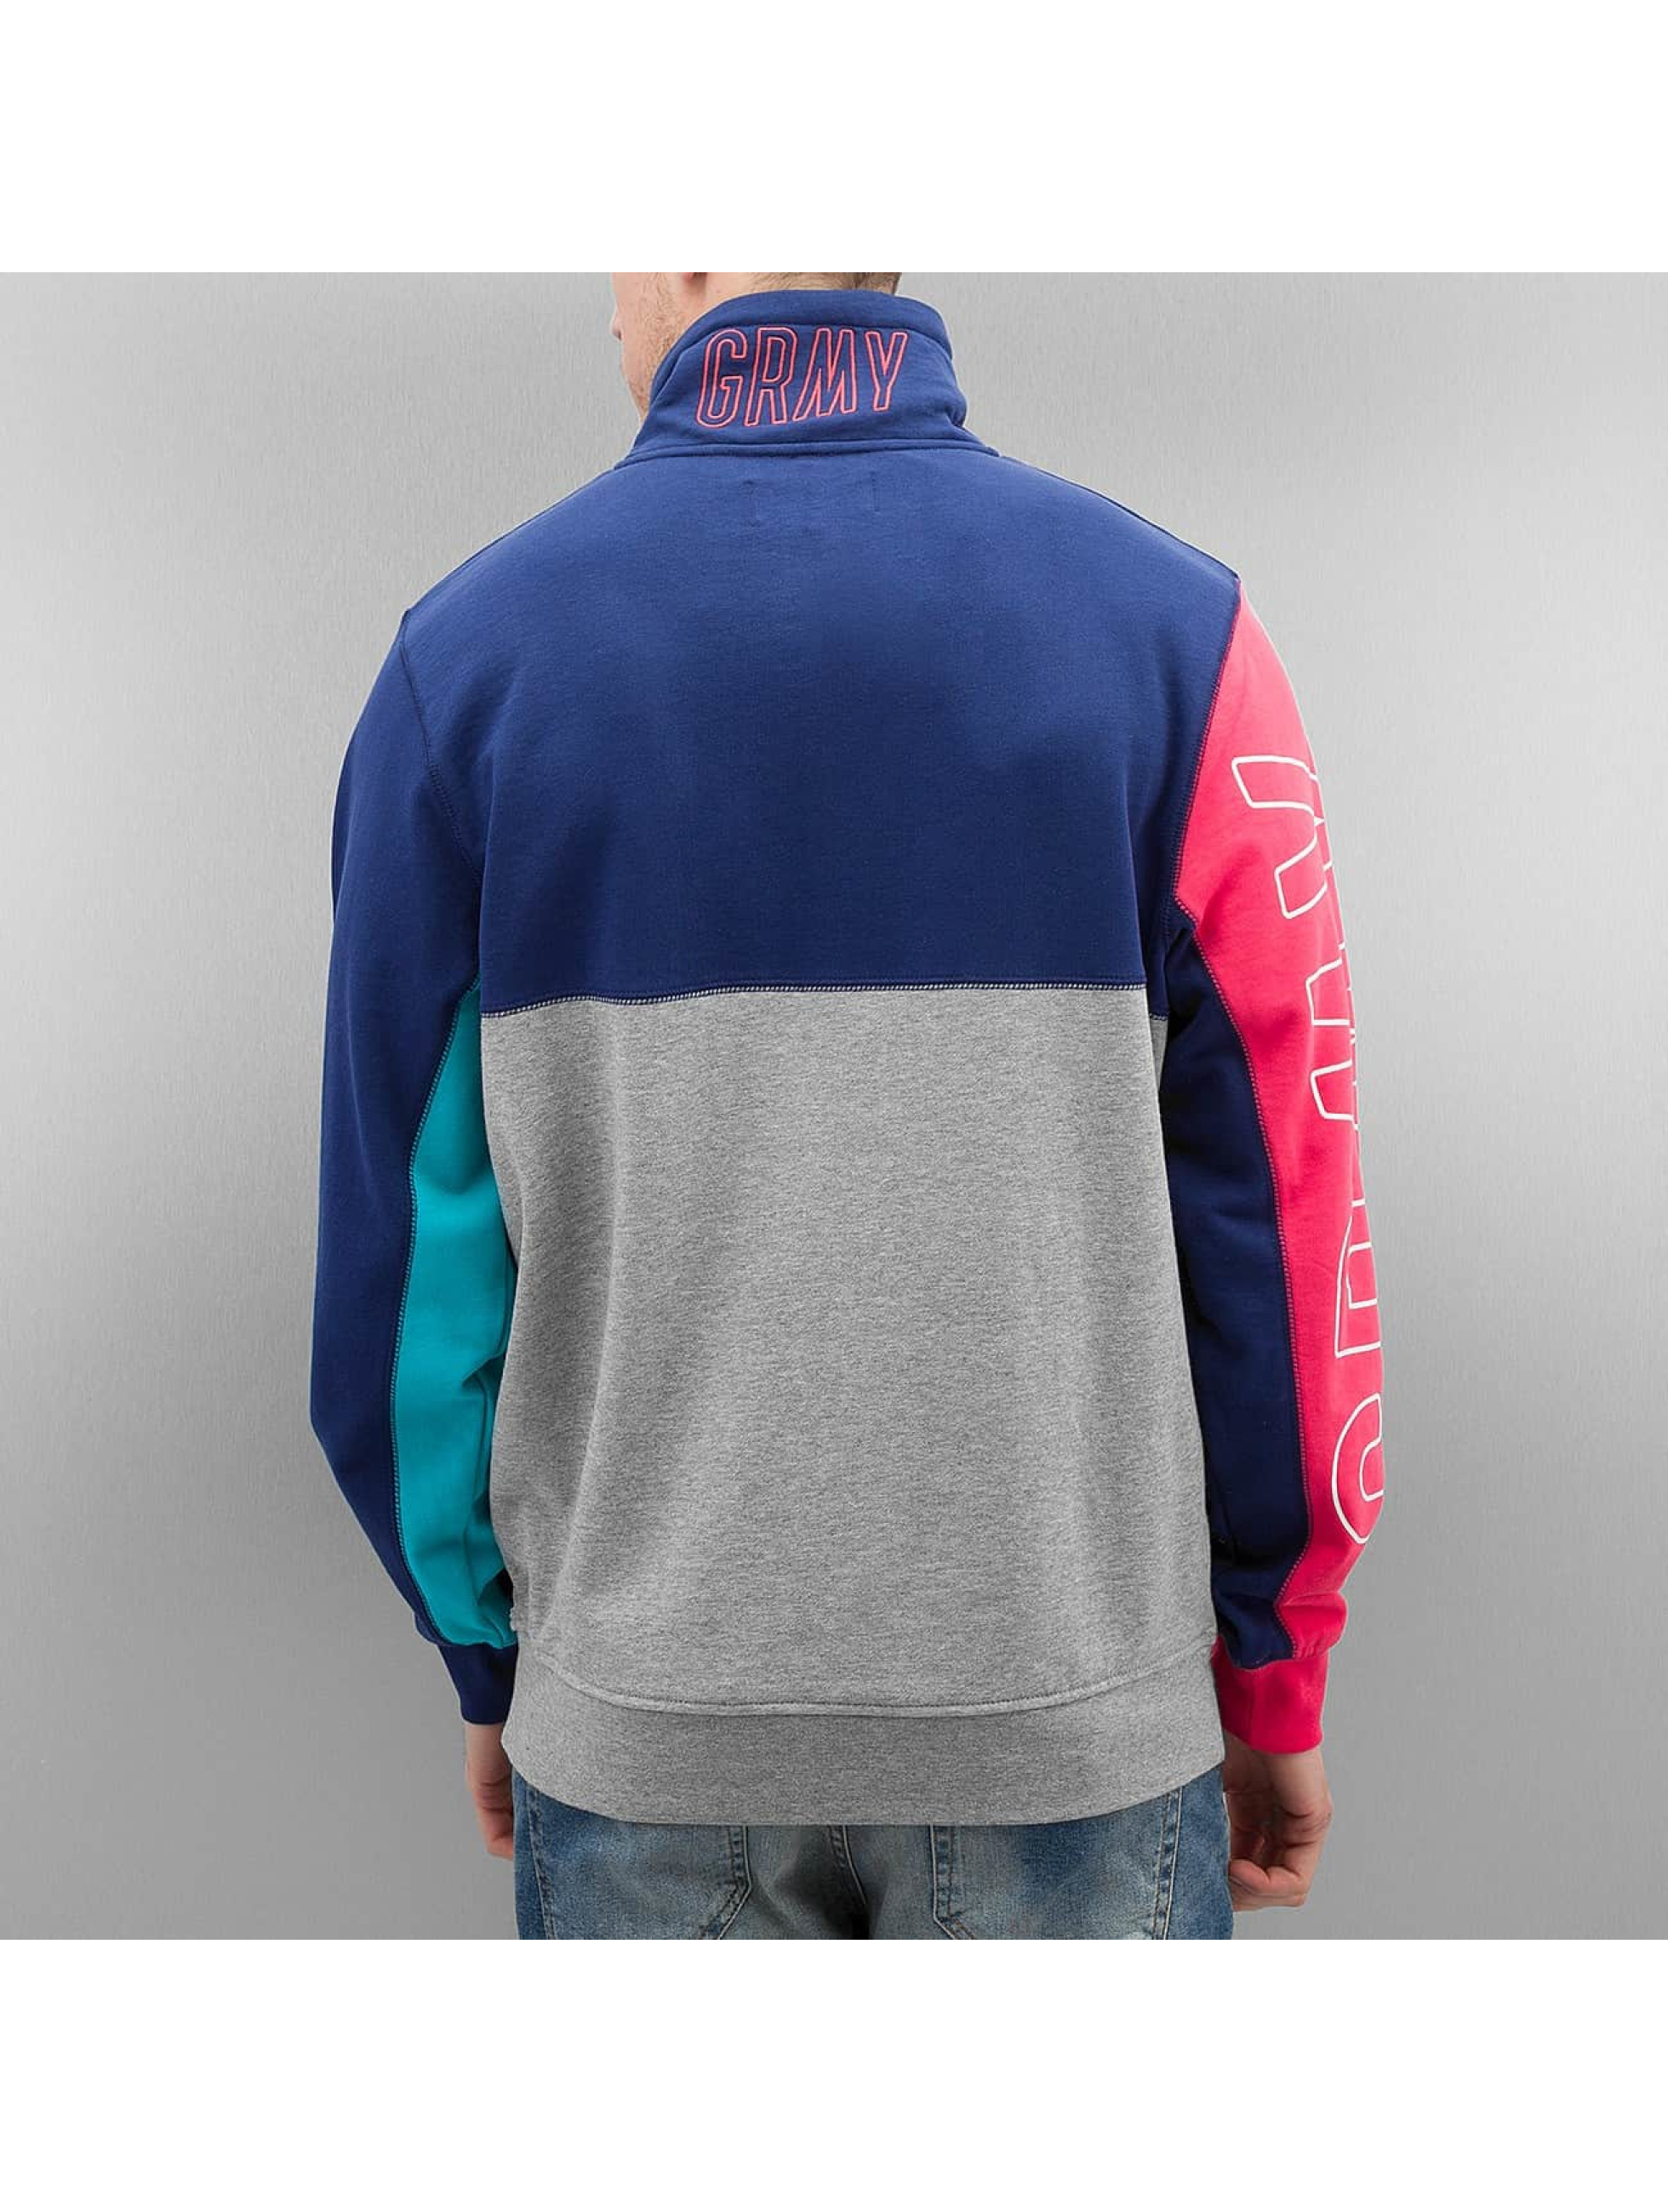 Grimey Wear Männer Pullover Rock Creek Park in blau